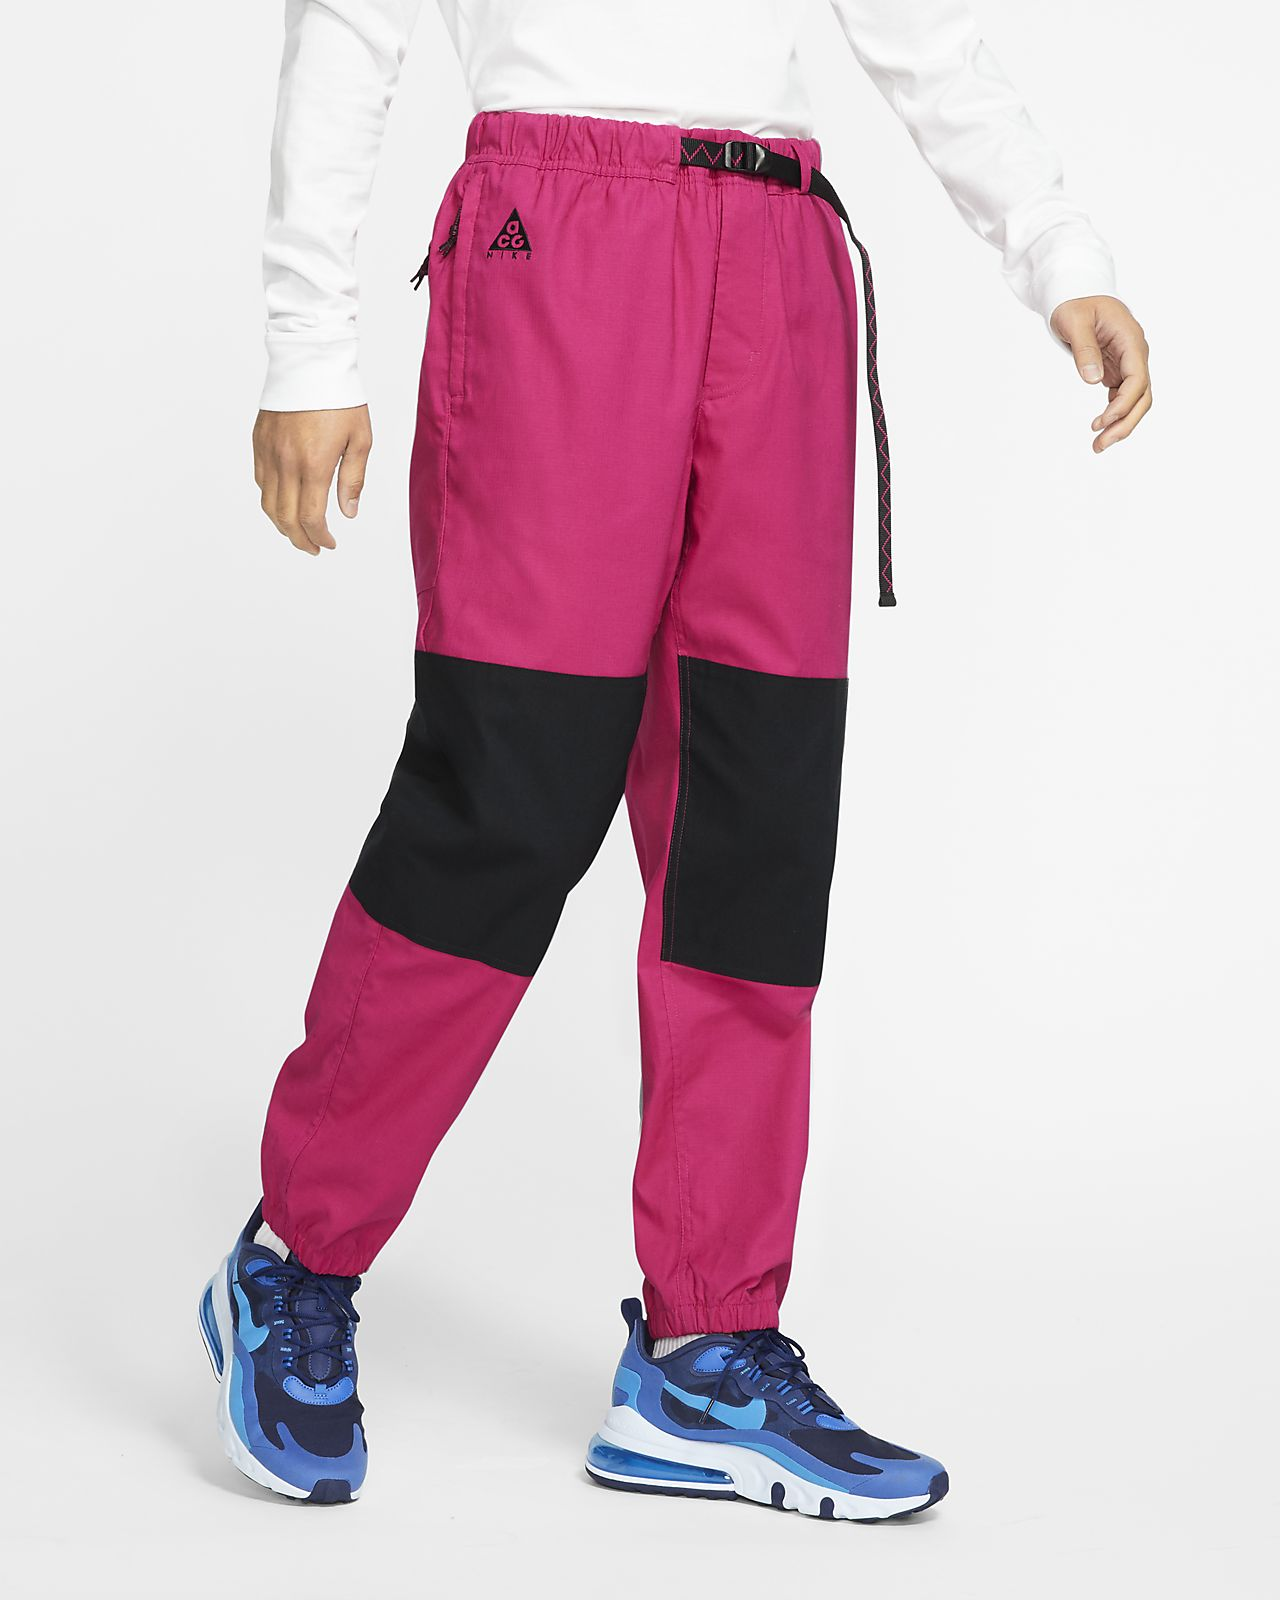 Nike ACG Pantalons de trail running - Home